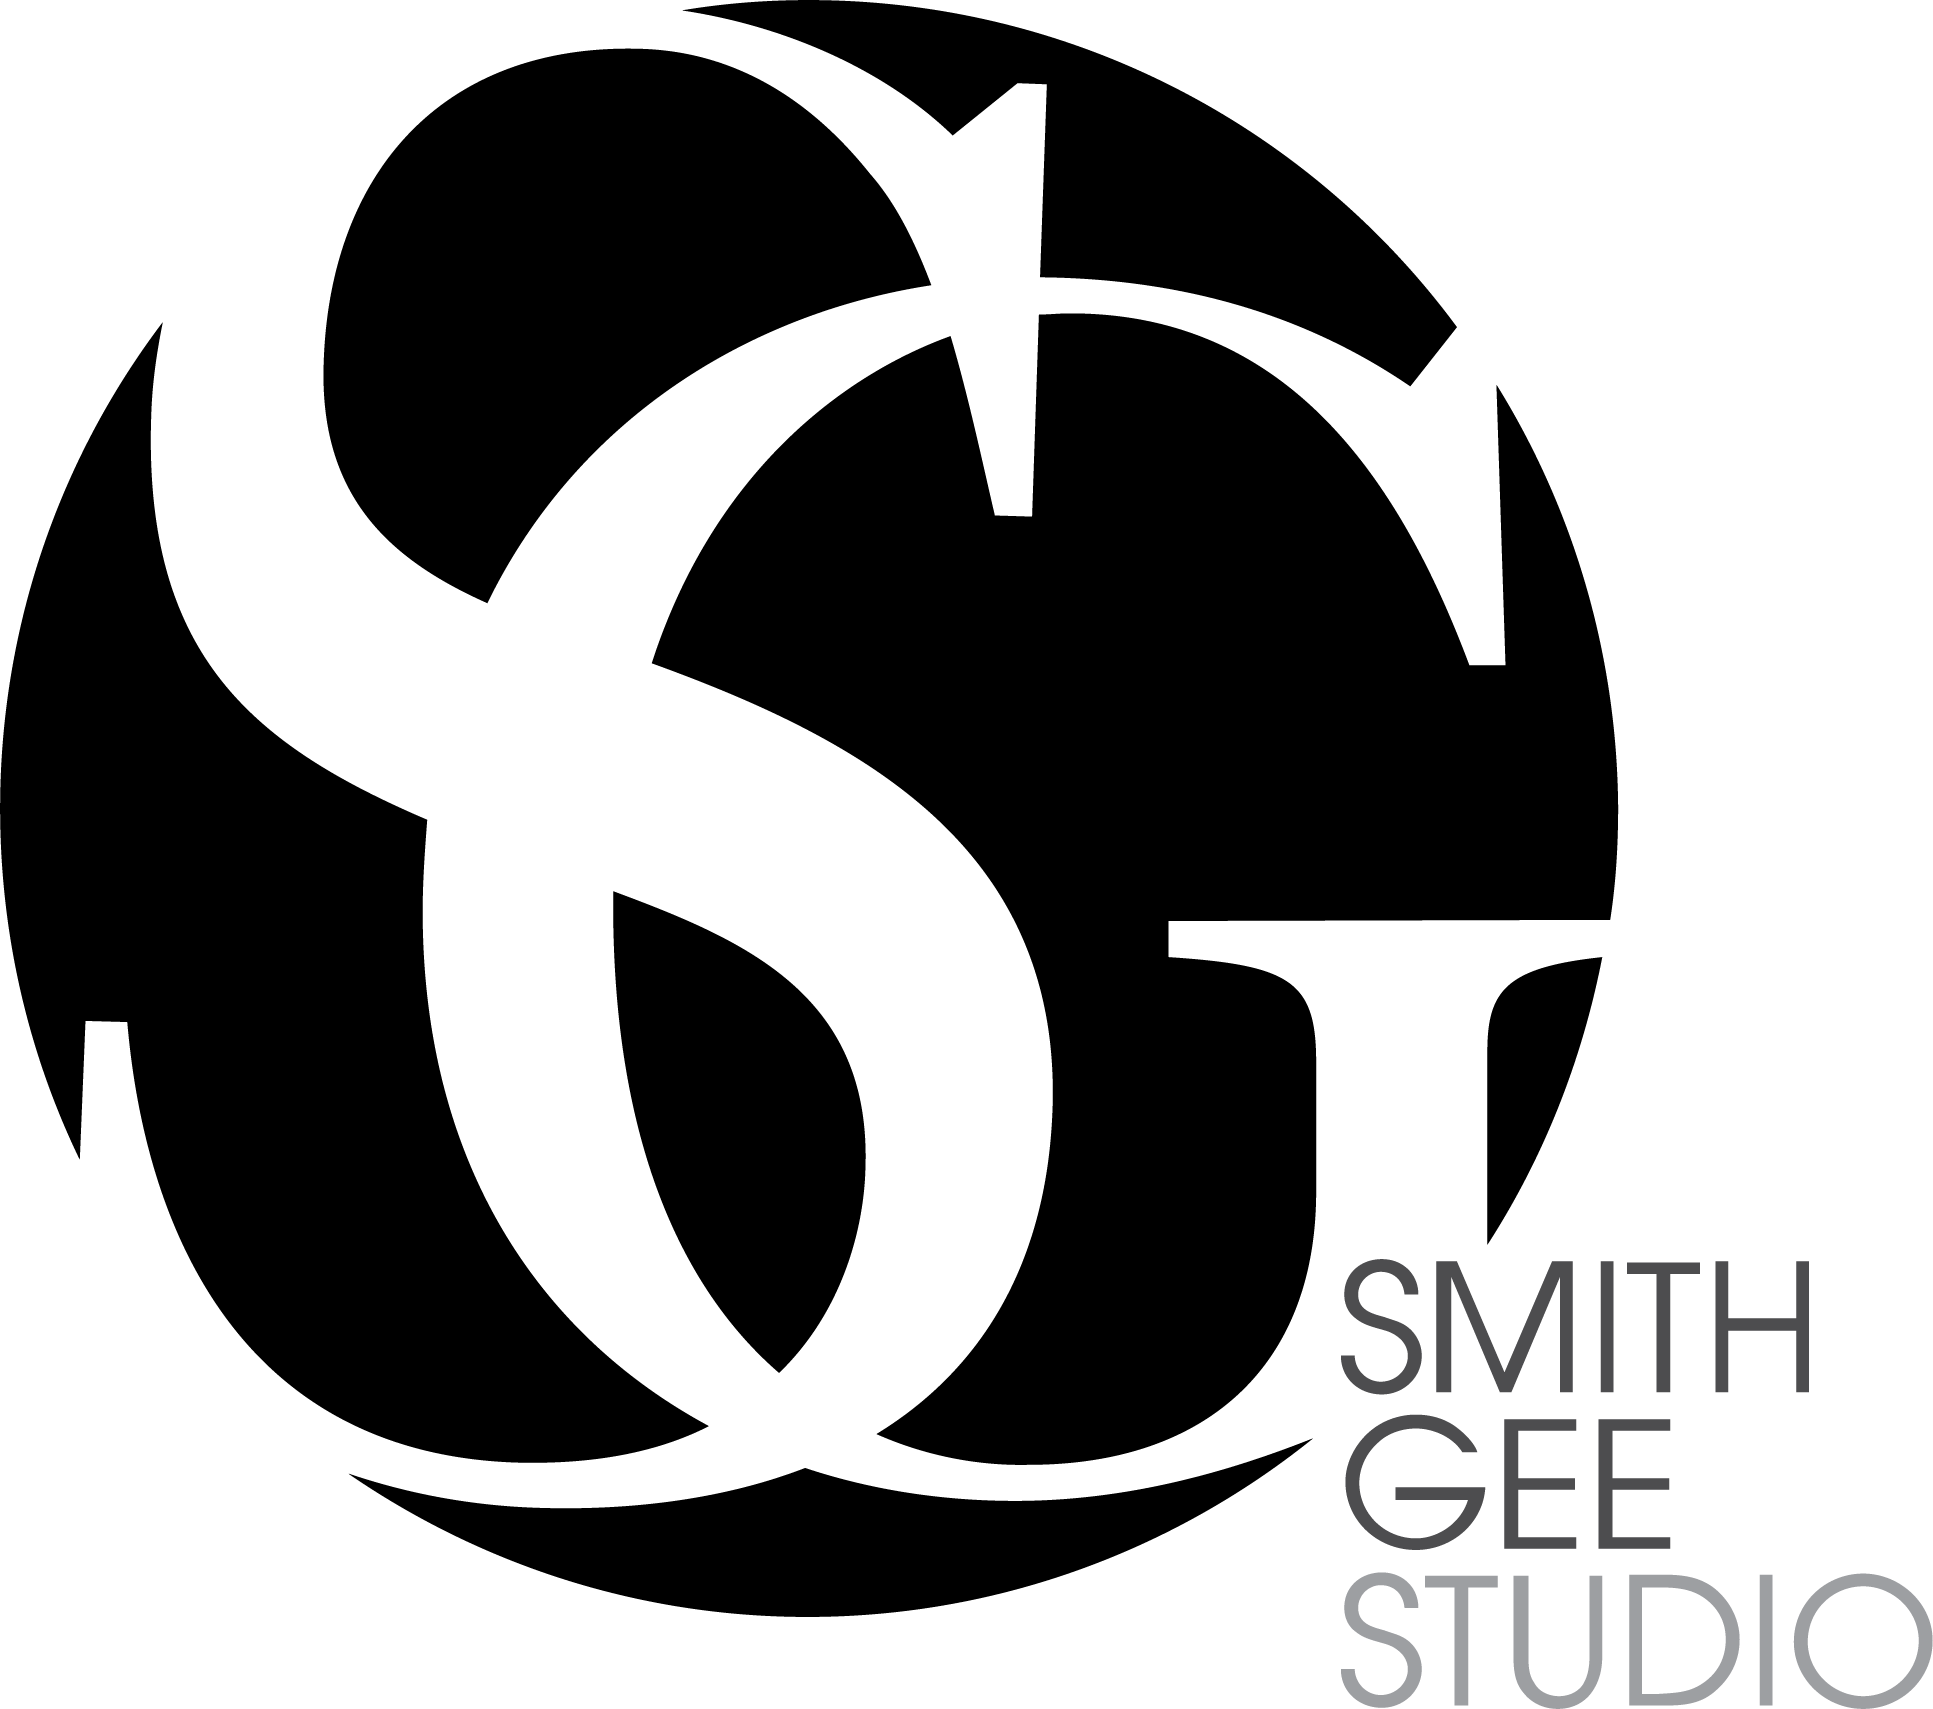 SmithGeeStudio.png